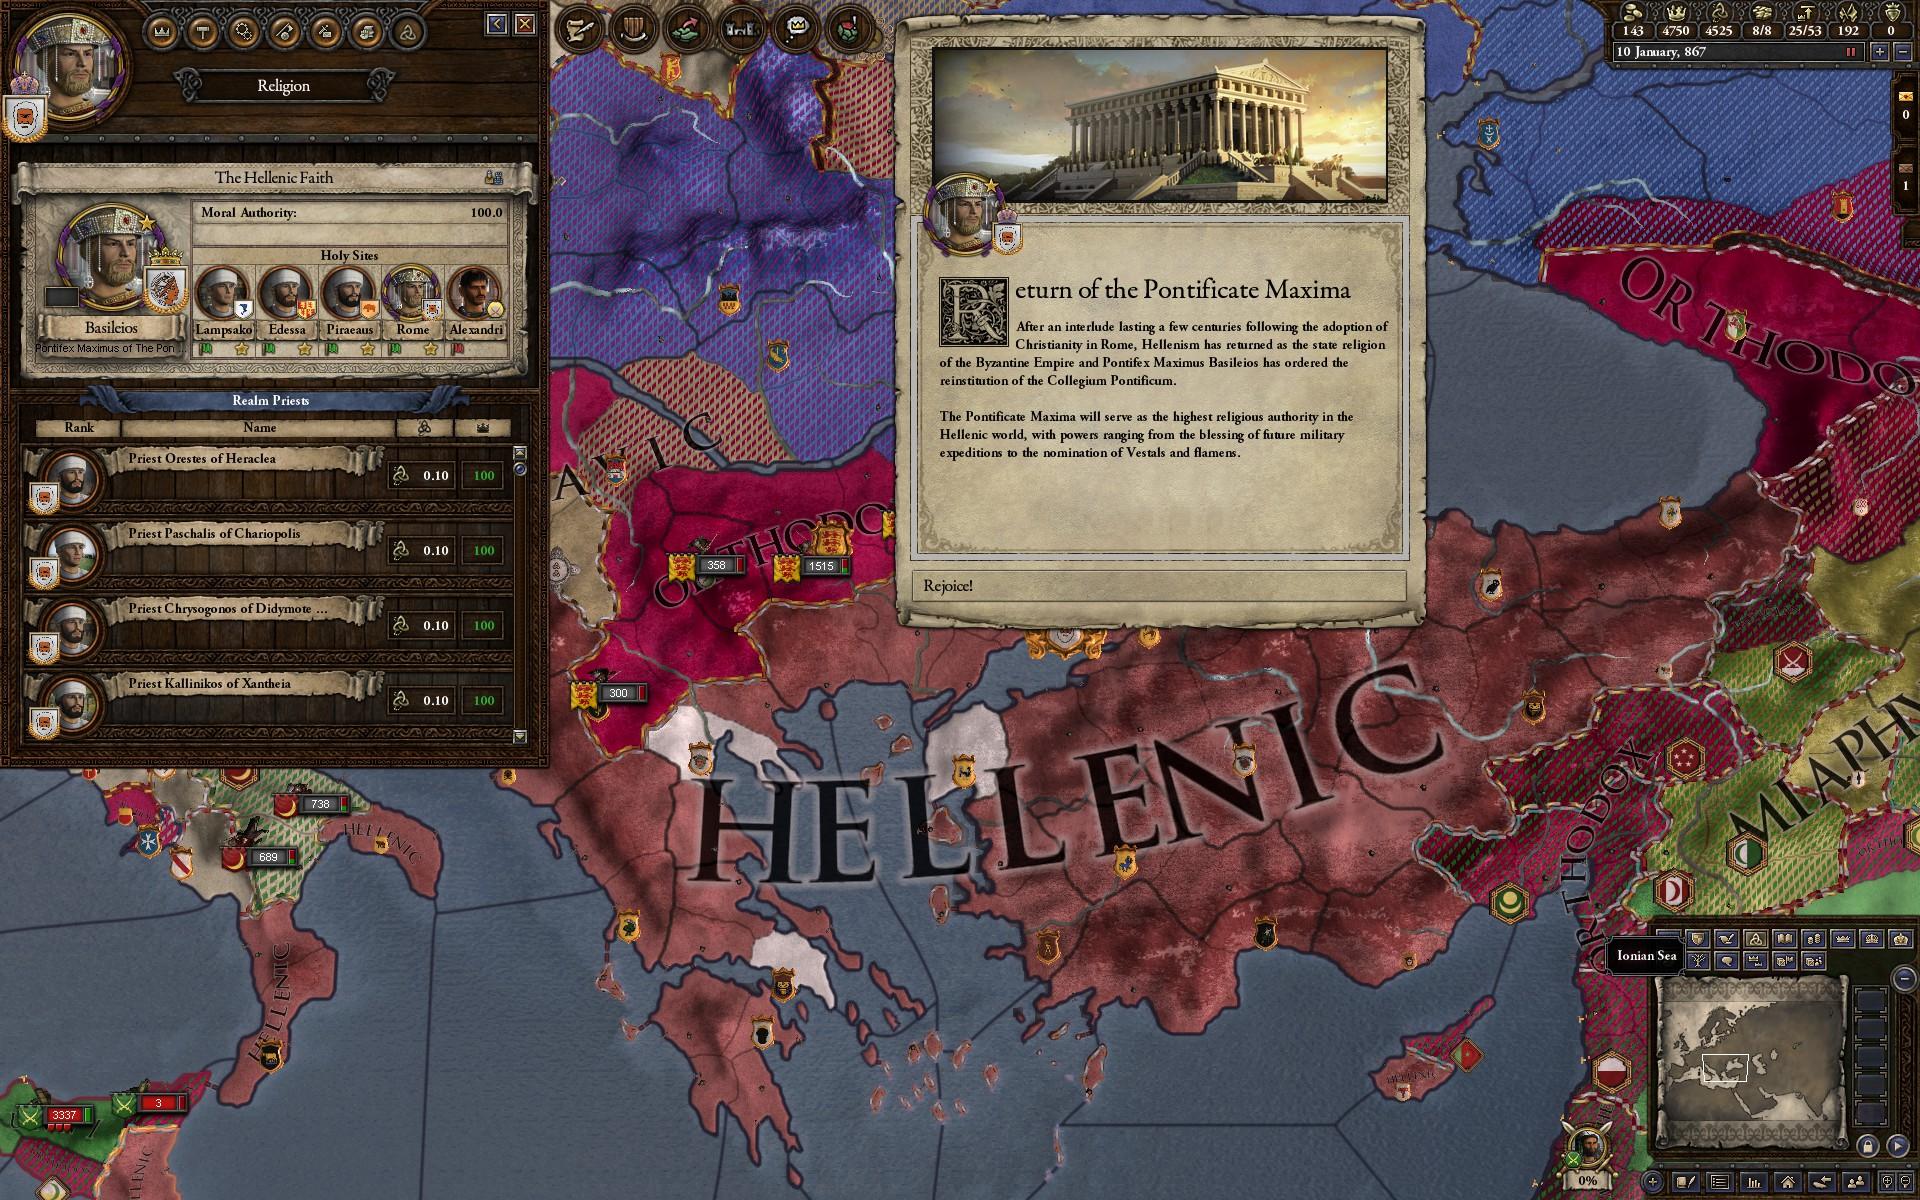 The crusader kings 2 mods